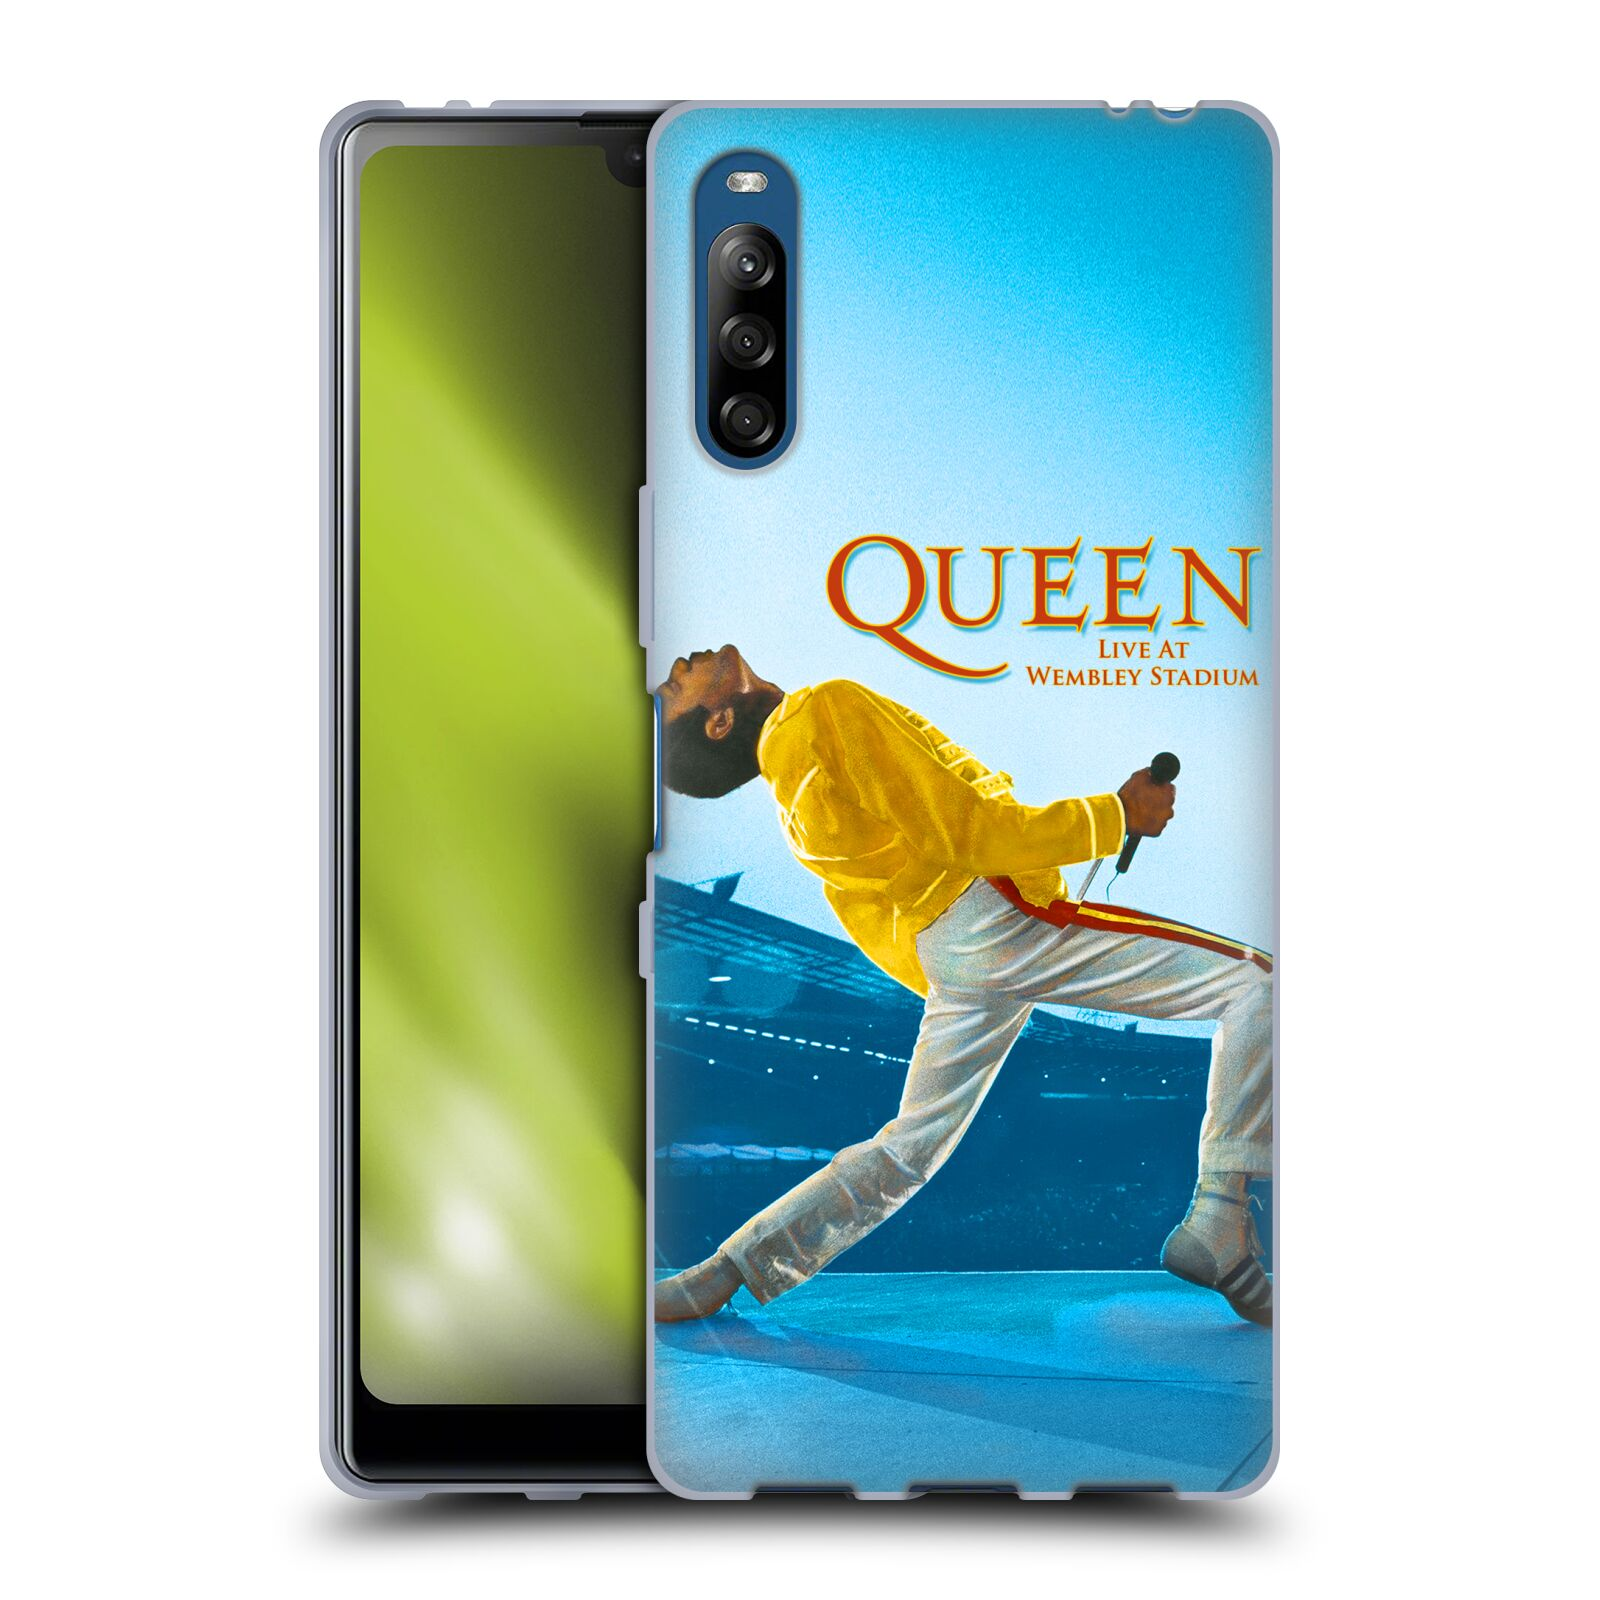 Silikonové pouzdro na mobil Sony Xperia L4 - Head Case - Queen - Freddie Mercury